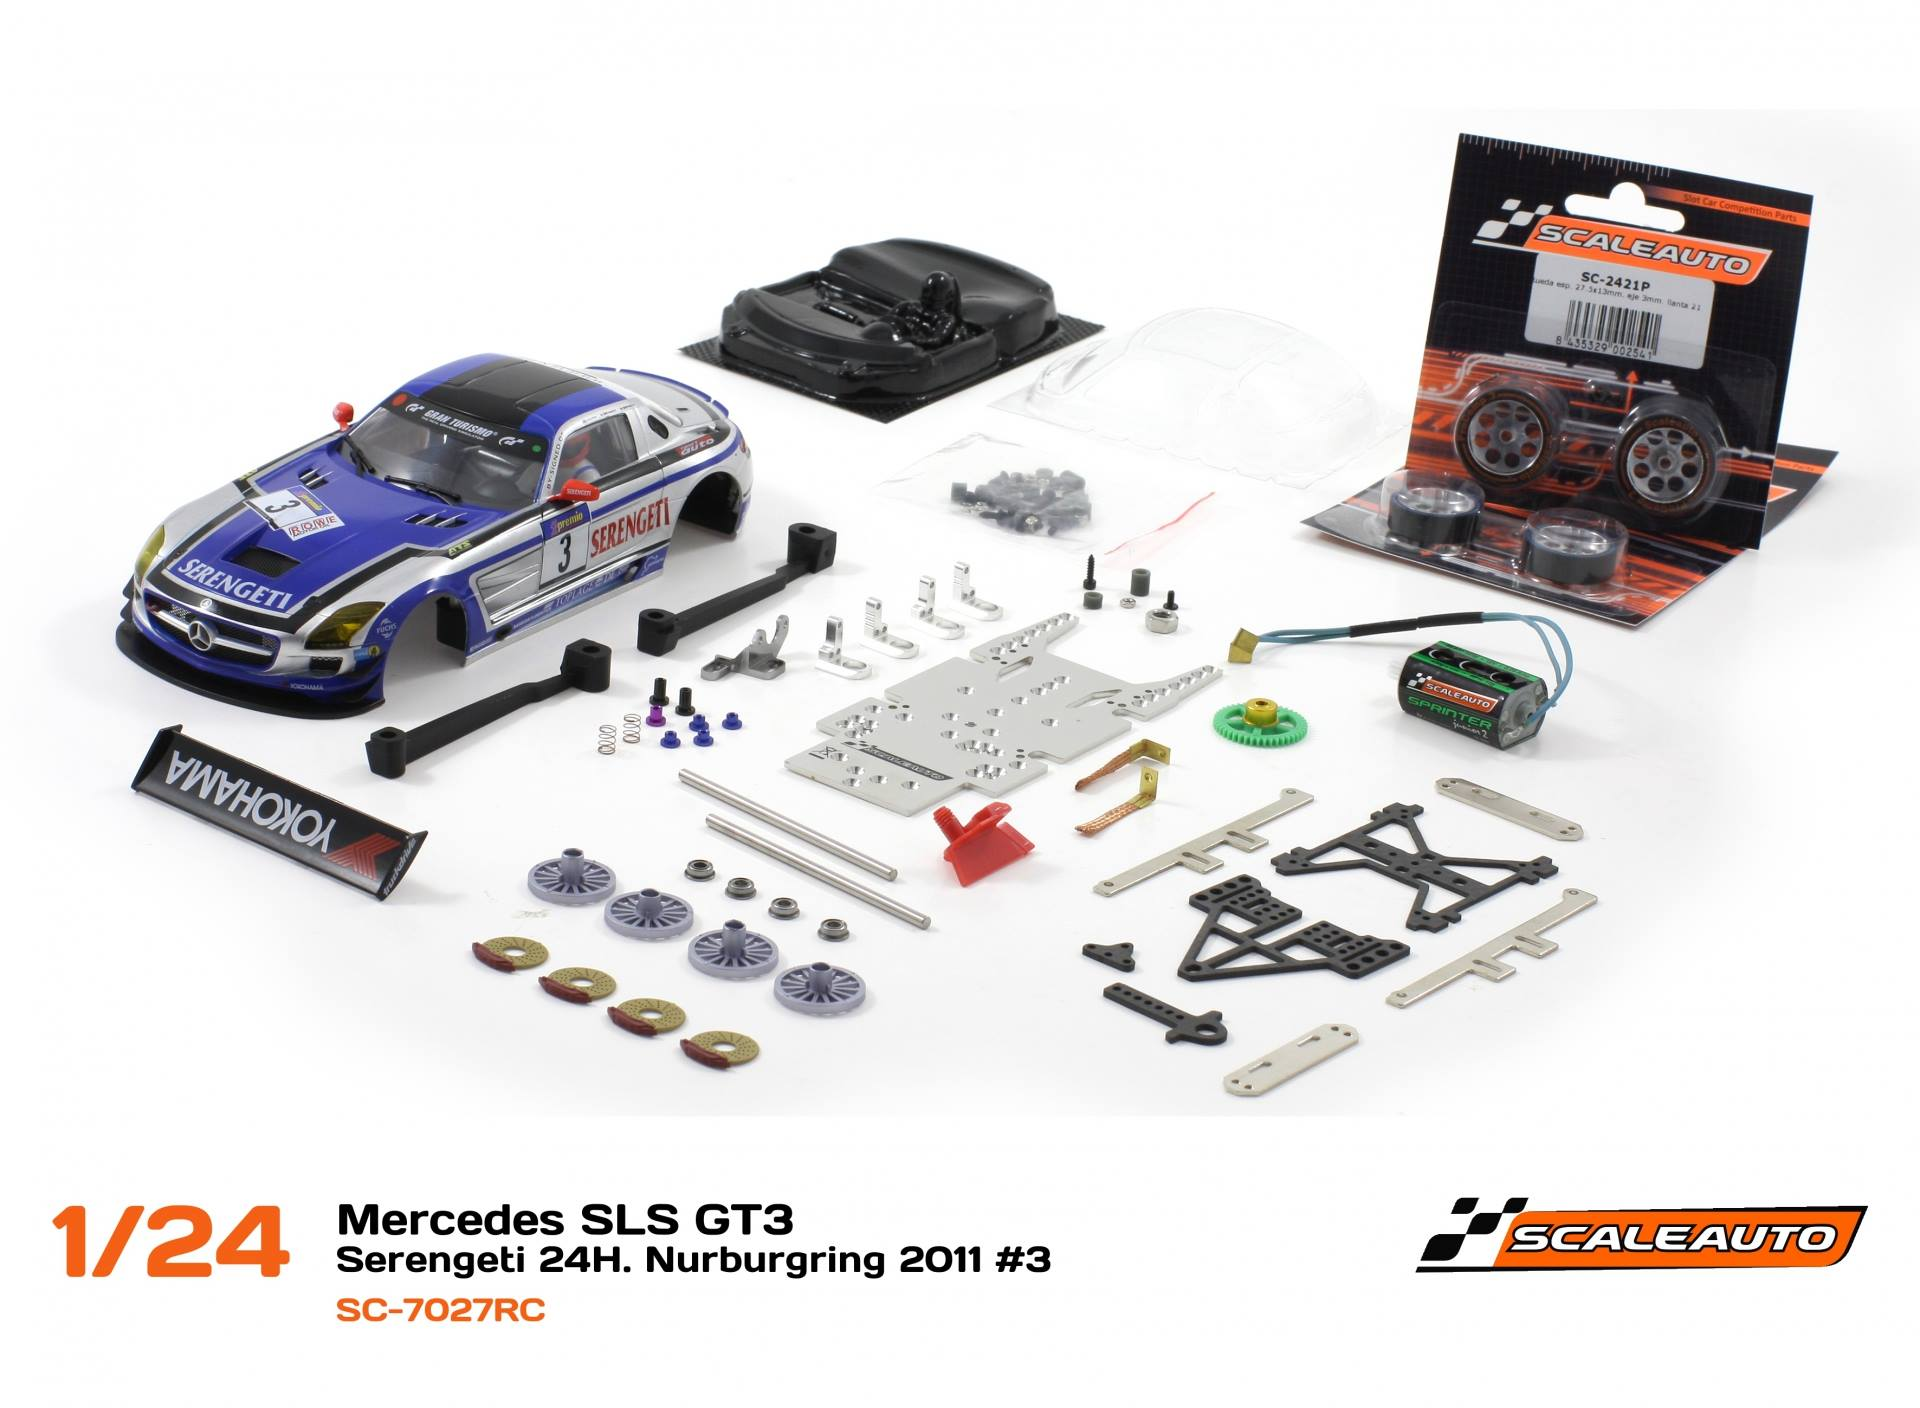 Mercedes SLS GT3 – Serengeti 24h Nurburgring 2011 #3 - SC-7027RC